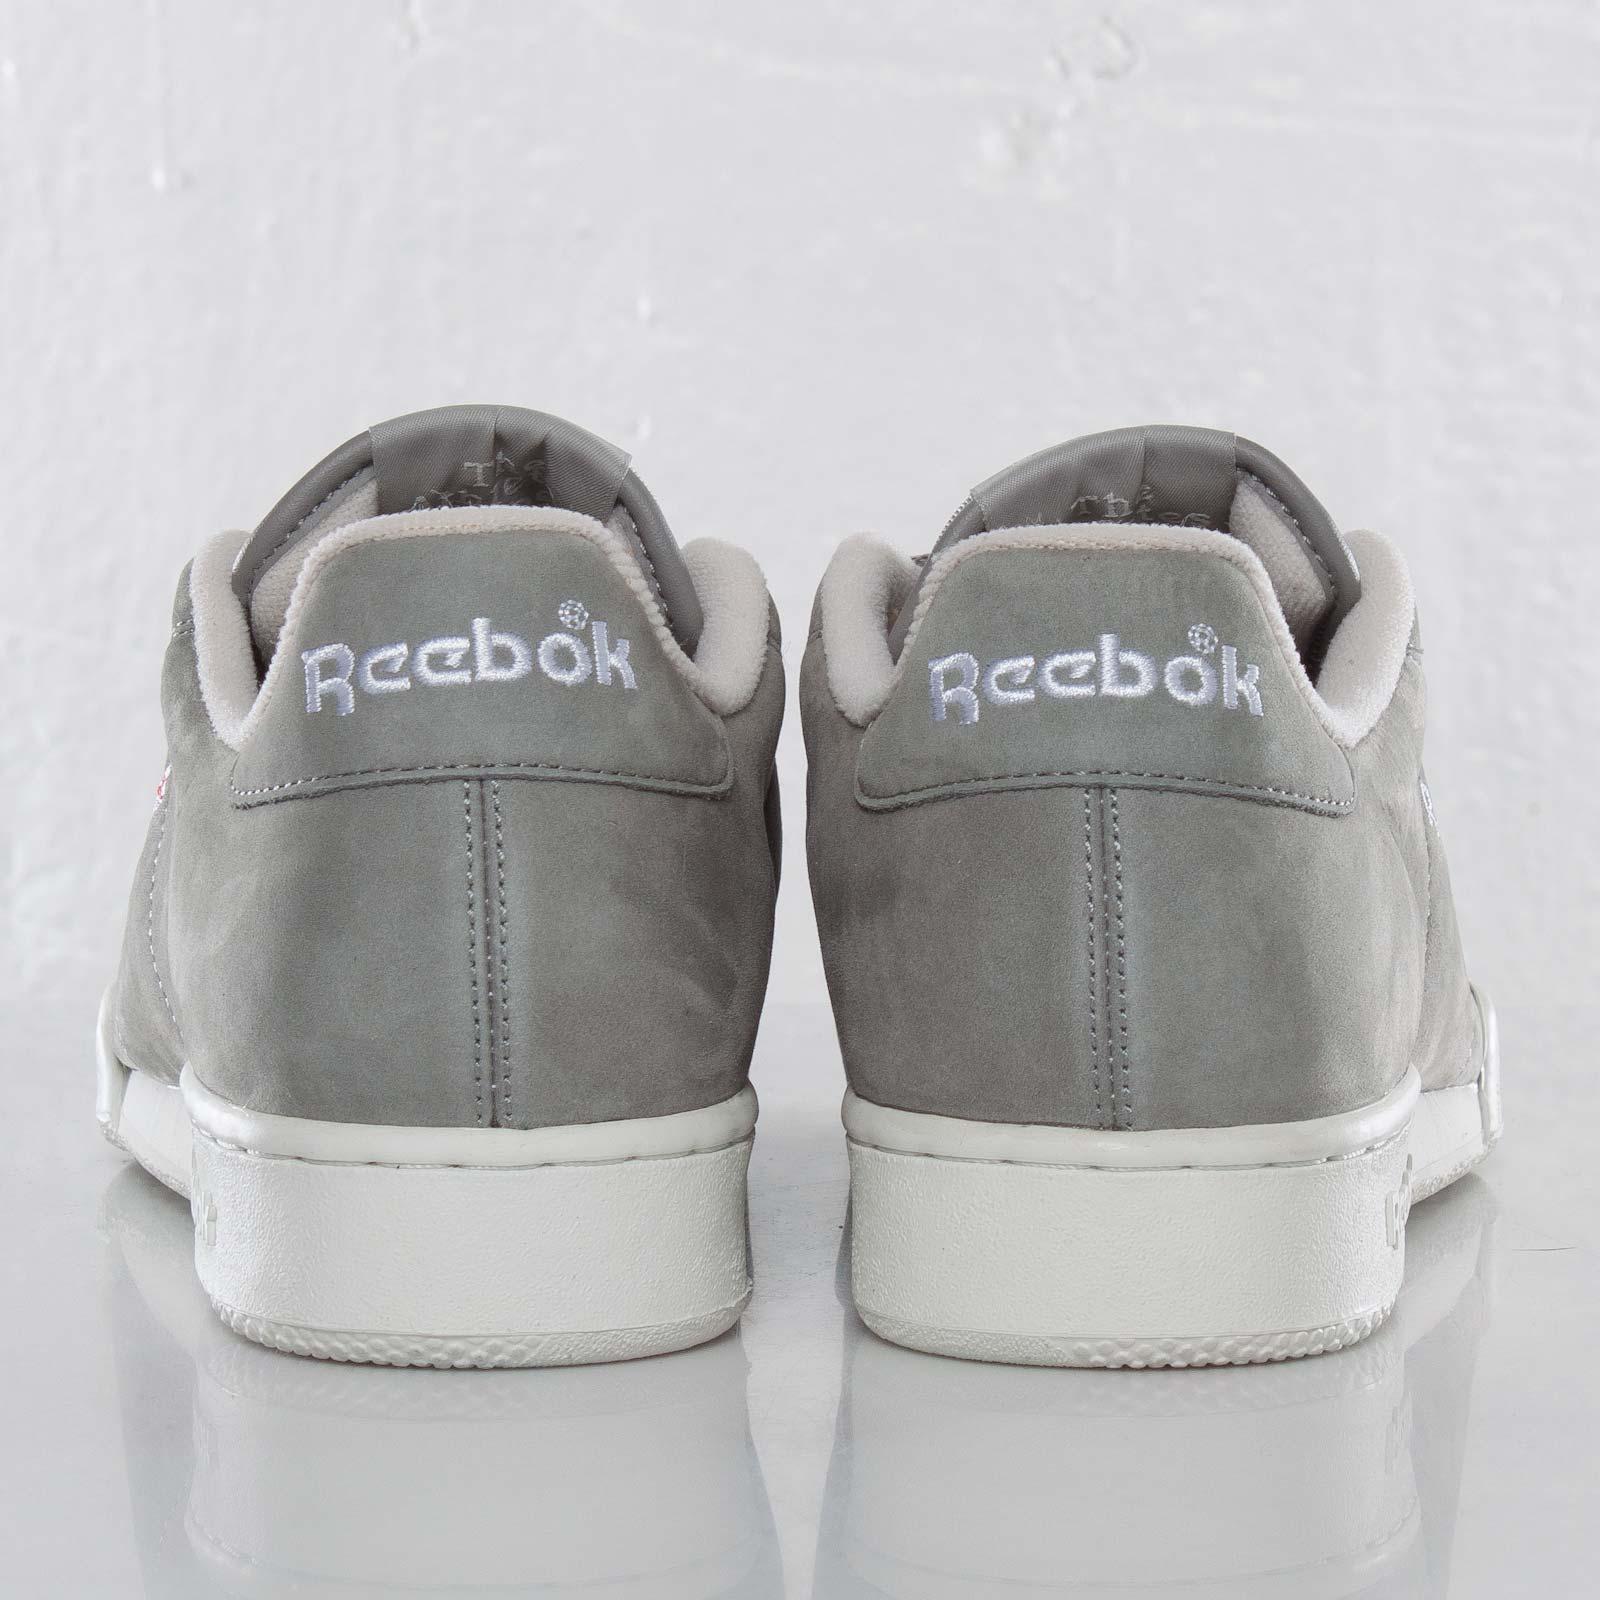 2dc73f26c9f Reebok NPC Vintage - J97417 - Sneakersnstuff